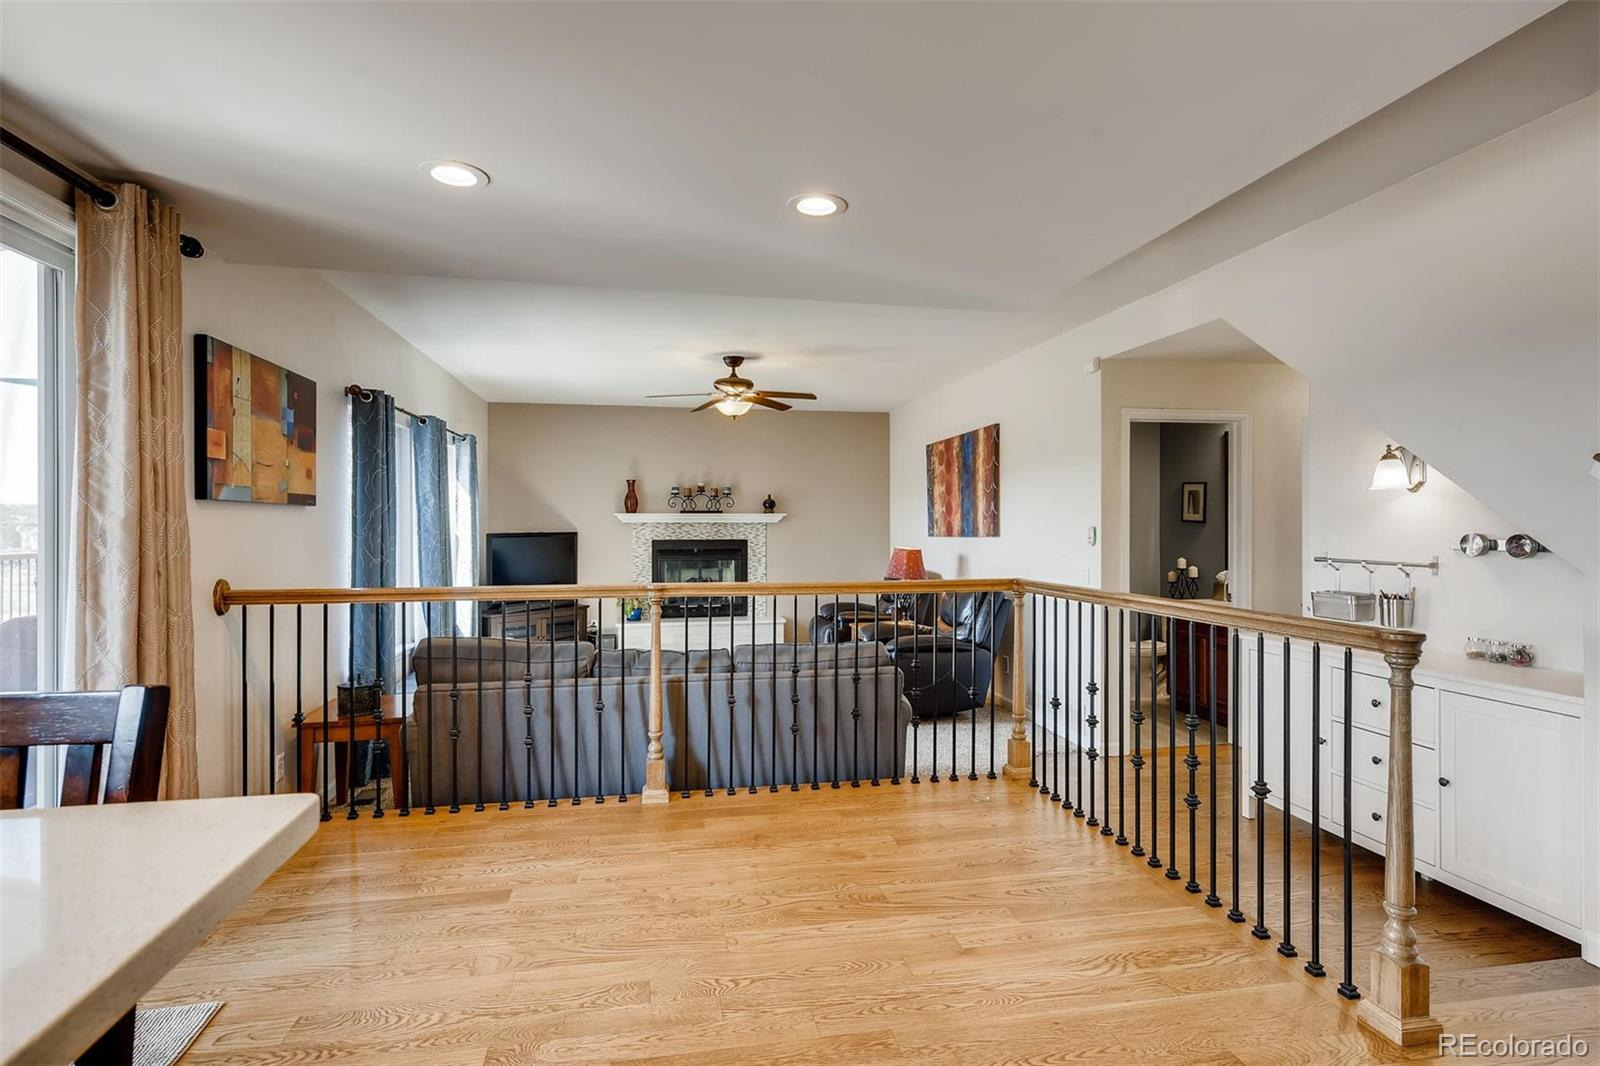 MLS# 2832026 - 9 - 1594 Arrowhead Road, Highlands Ranch, CO 80126